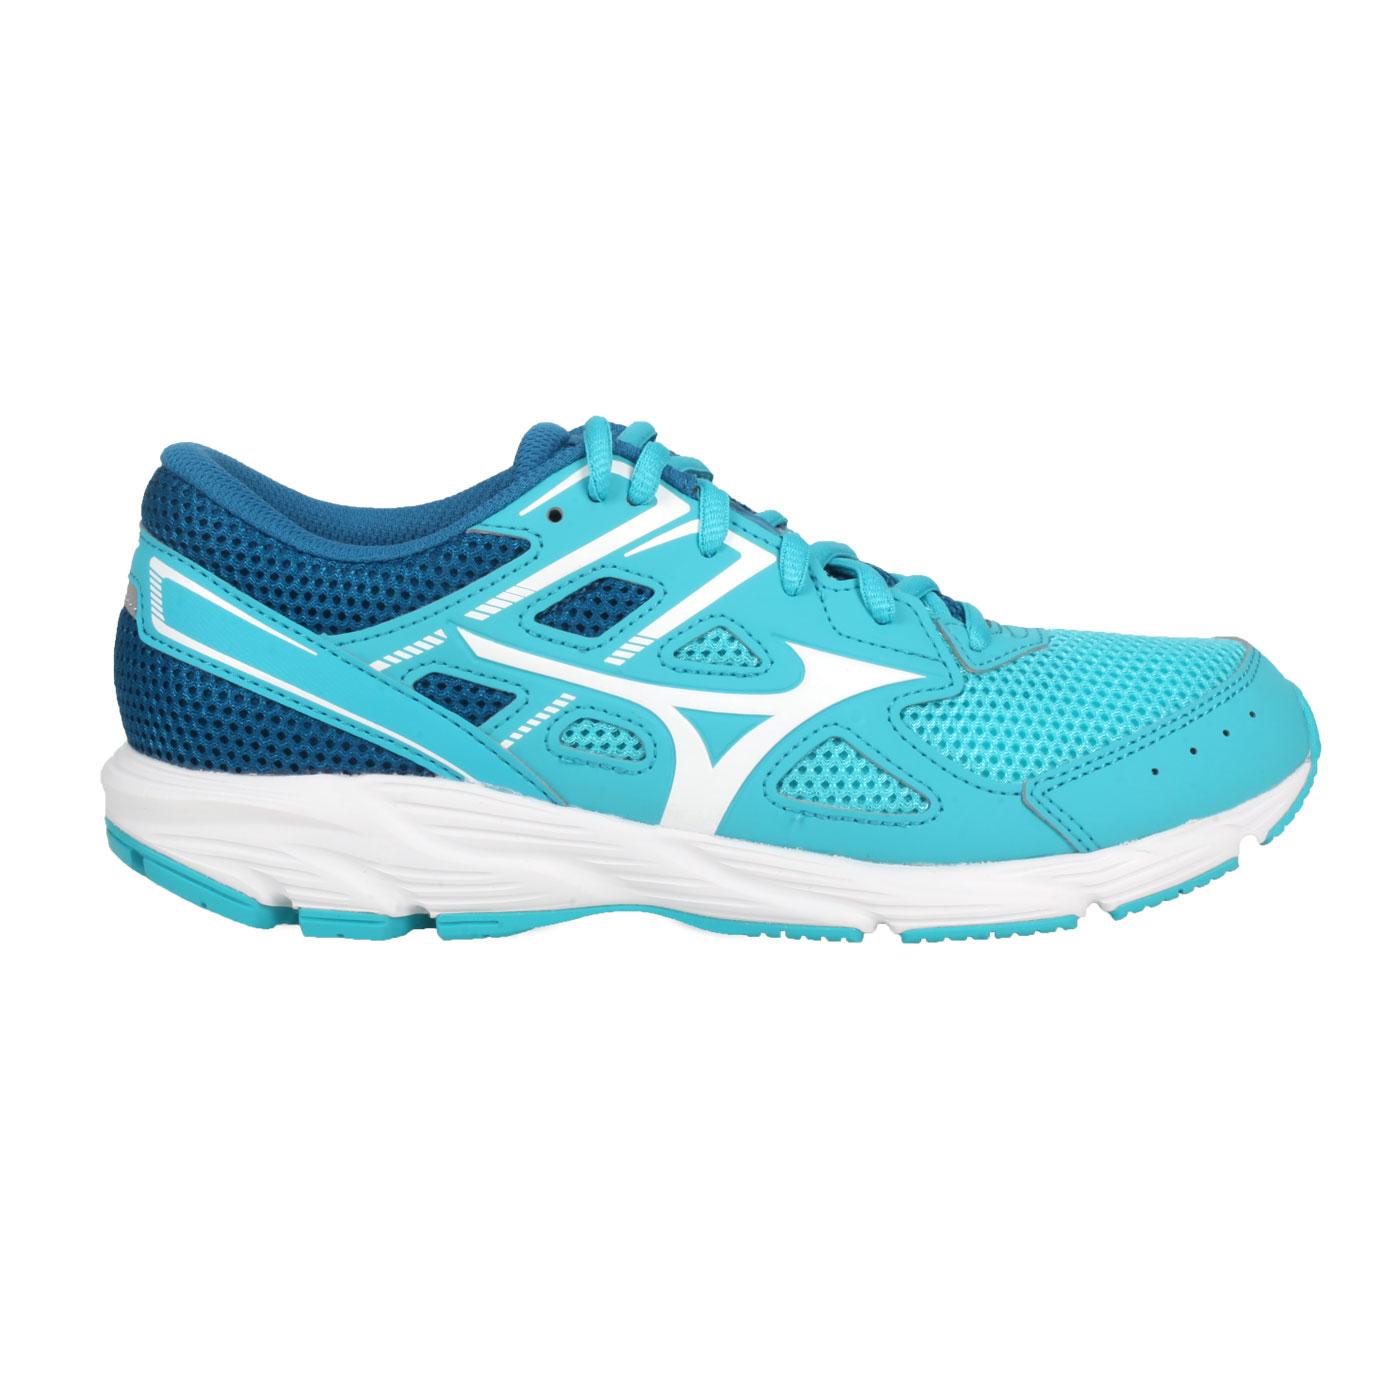 MIZUNO 女款慢跑鞋  @ SPARK 6@K1GA210402 - 藍湖水綠白